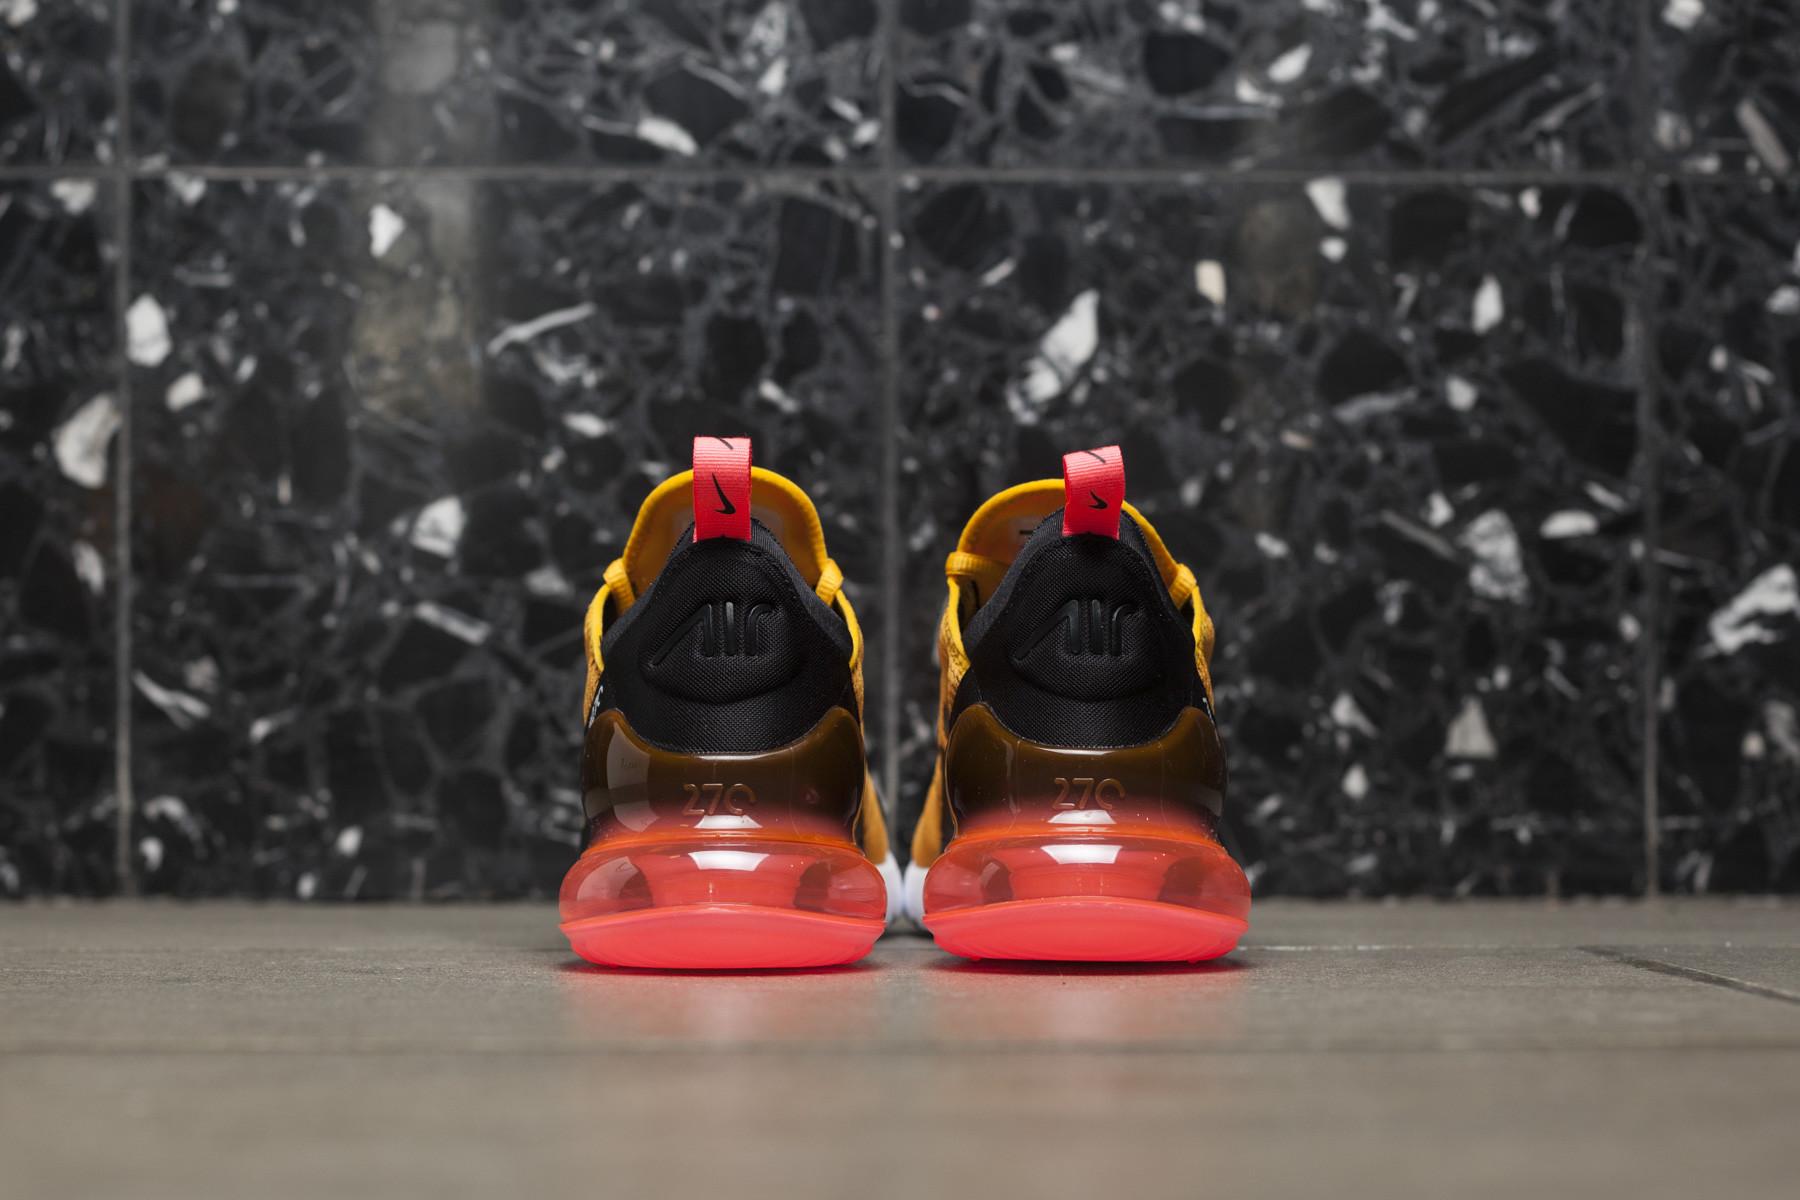 Nike Air Max 270 BlackBlack Hot Punch For Sale